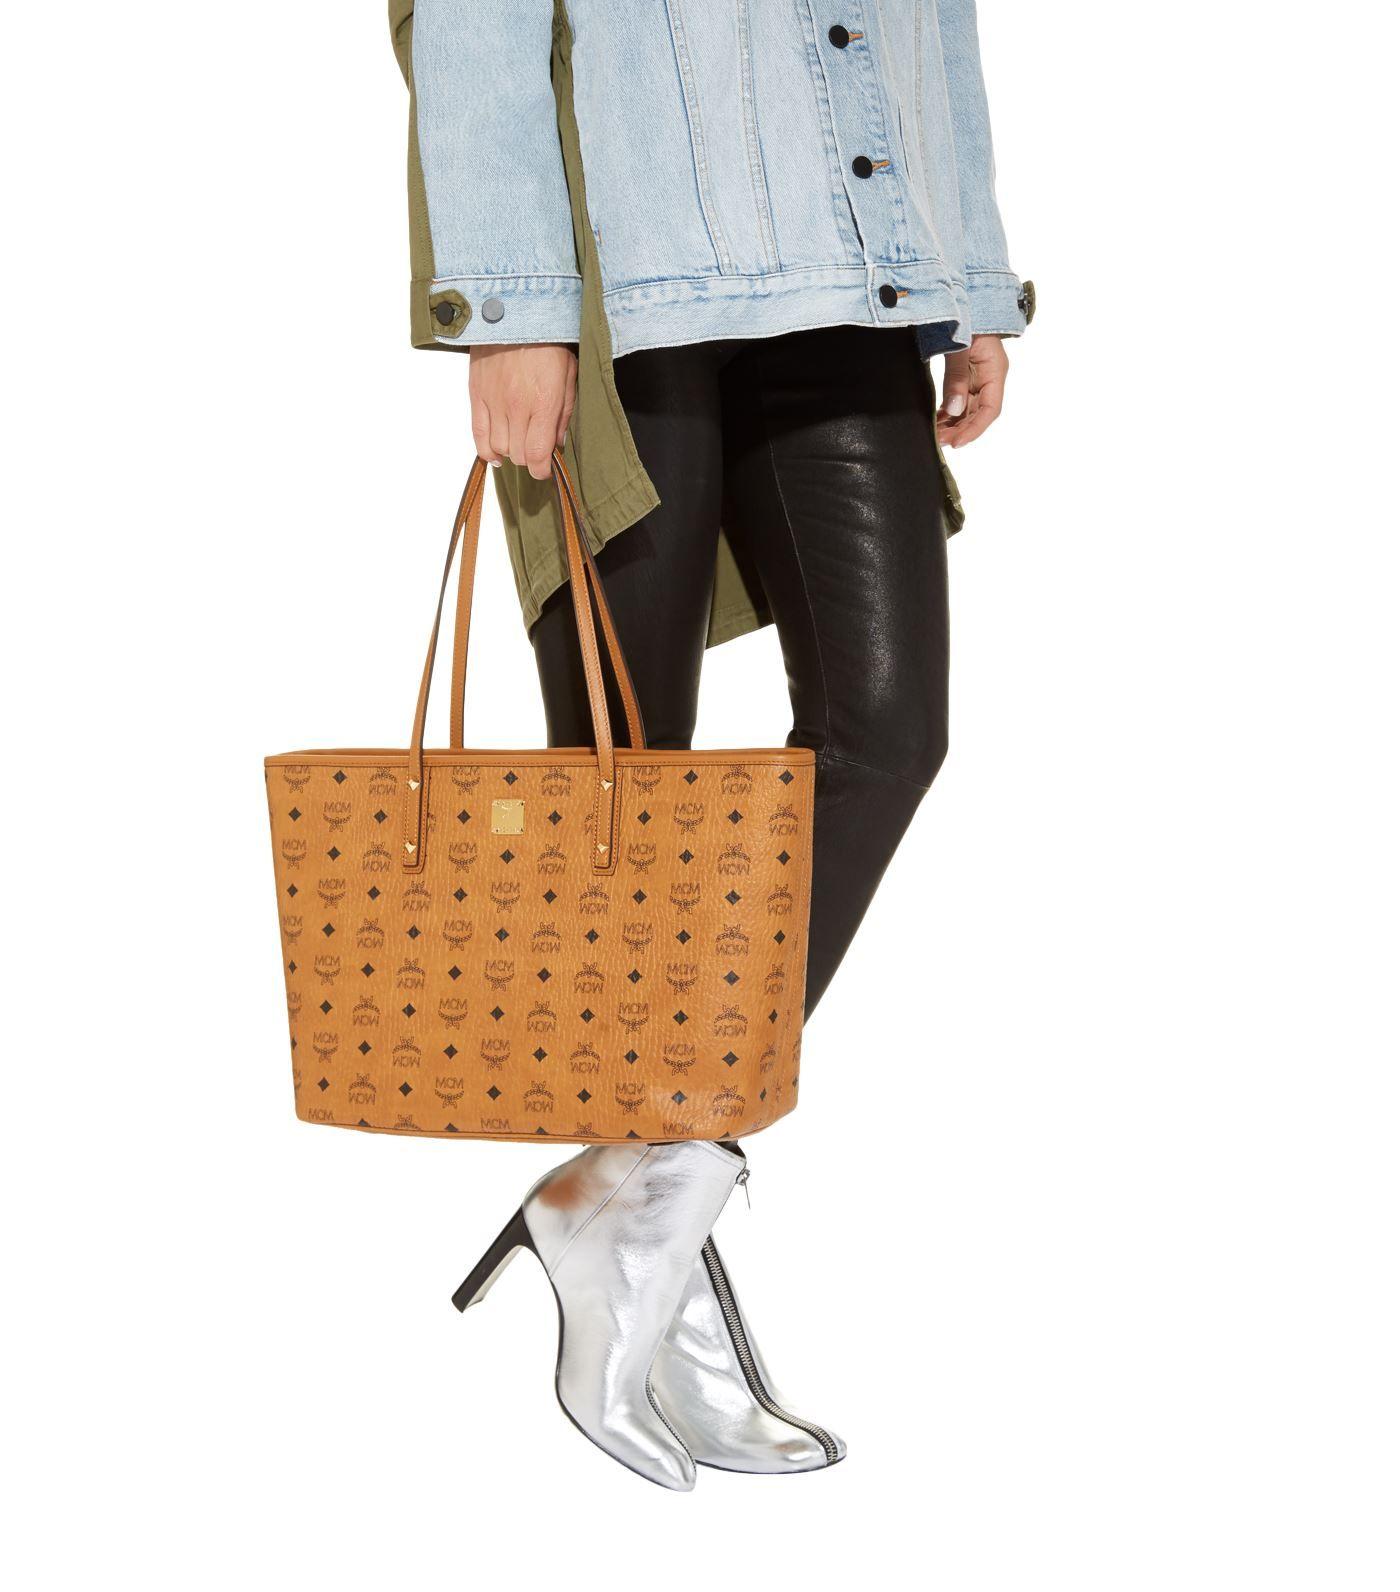 Medium Anya Top Zip Shopper | Medium bags, Shopper bag, Harrods